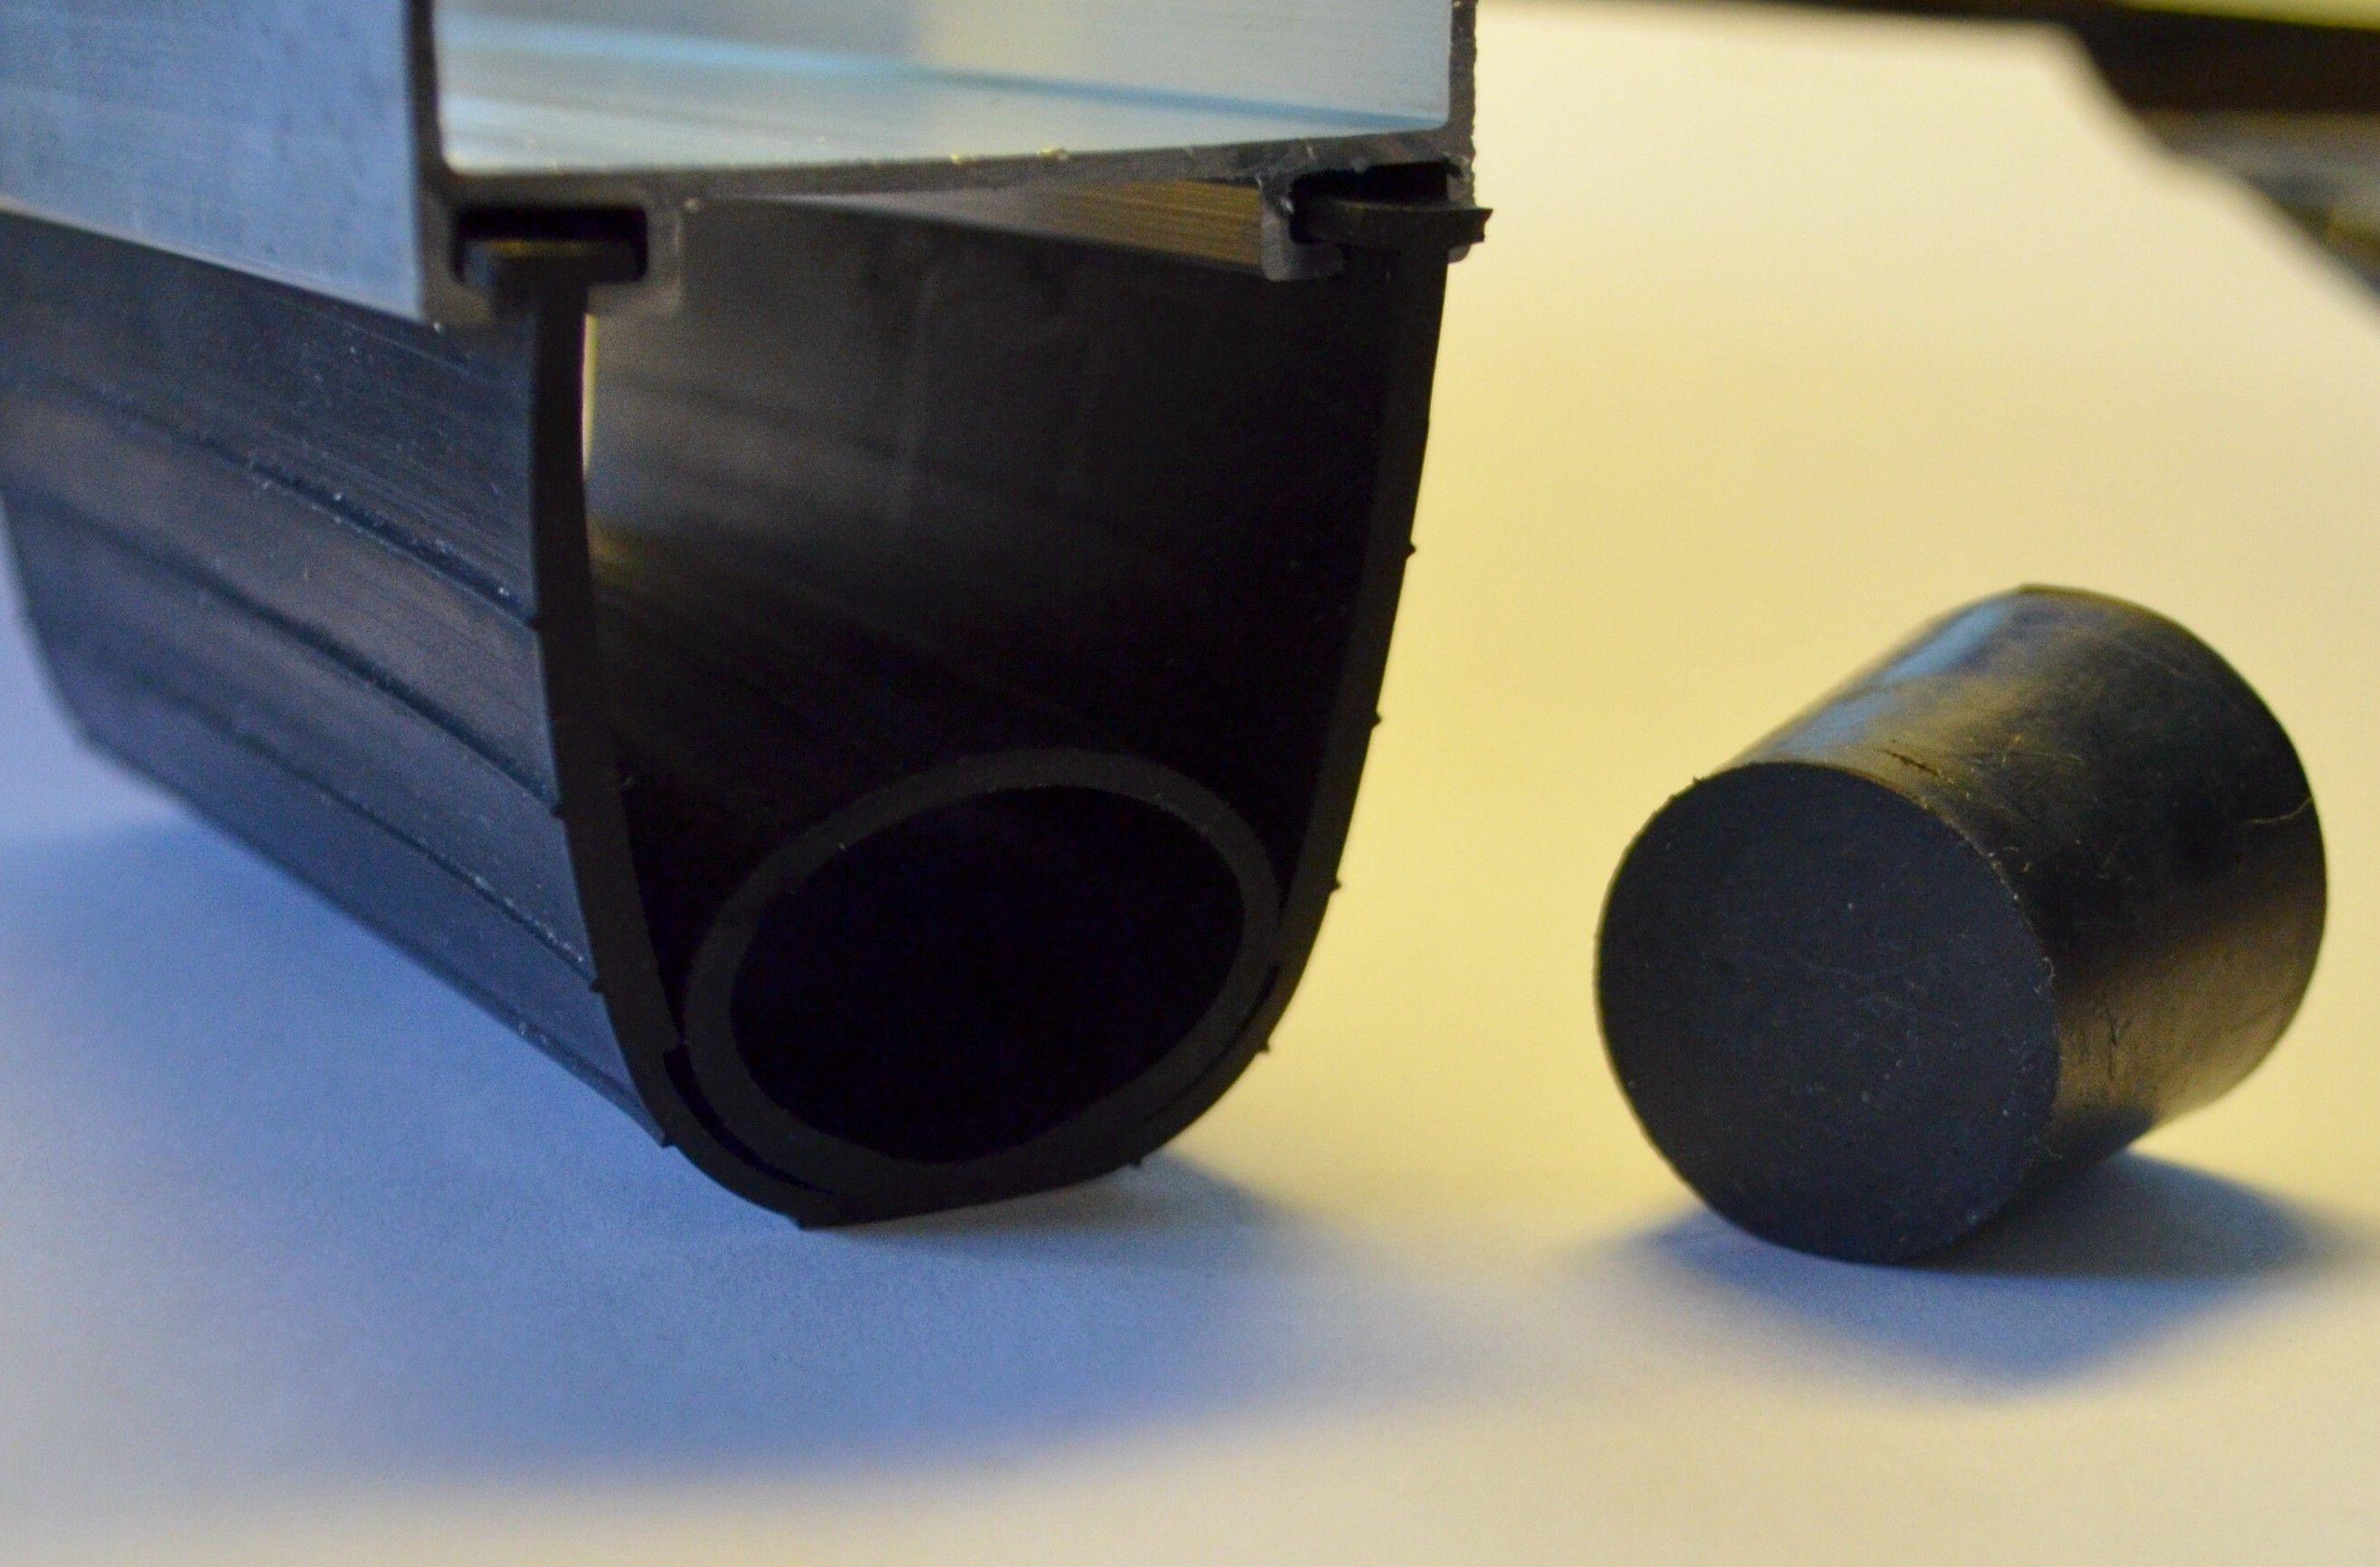 Rubber seal for garage door bottom httpvoteno123 rubber seal for garage door bottom rubansaba